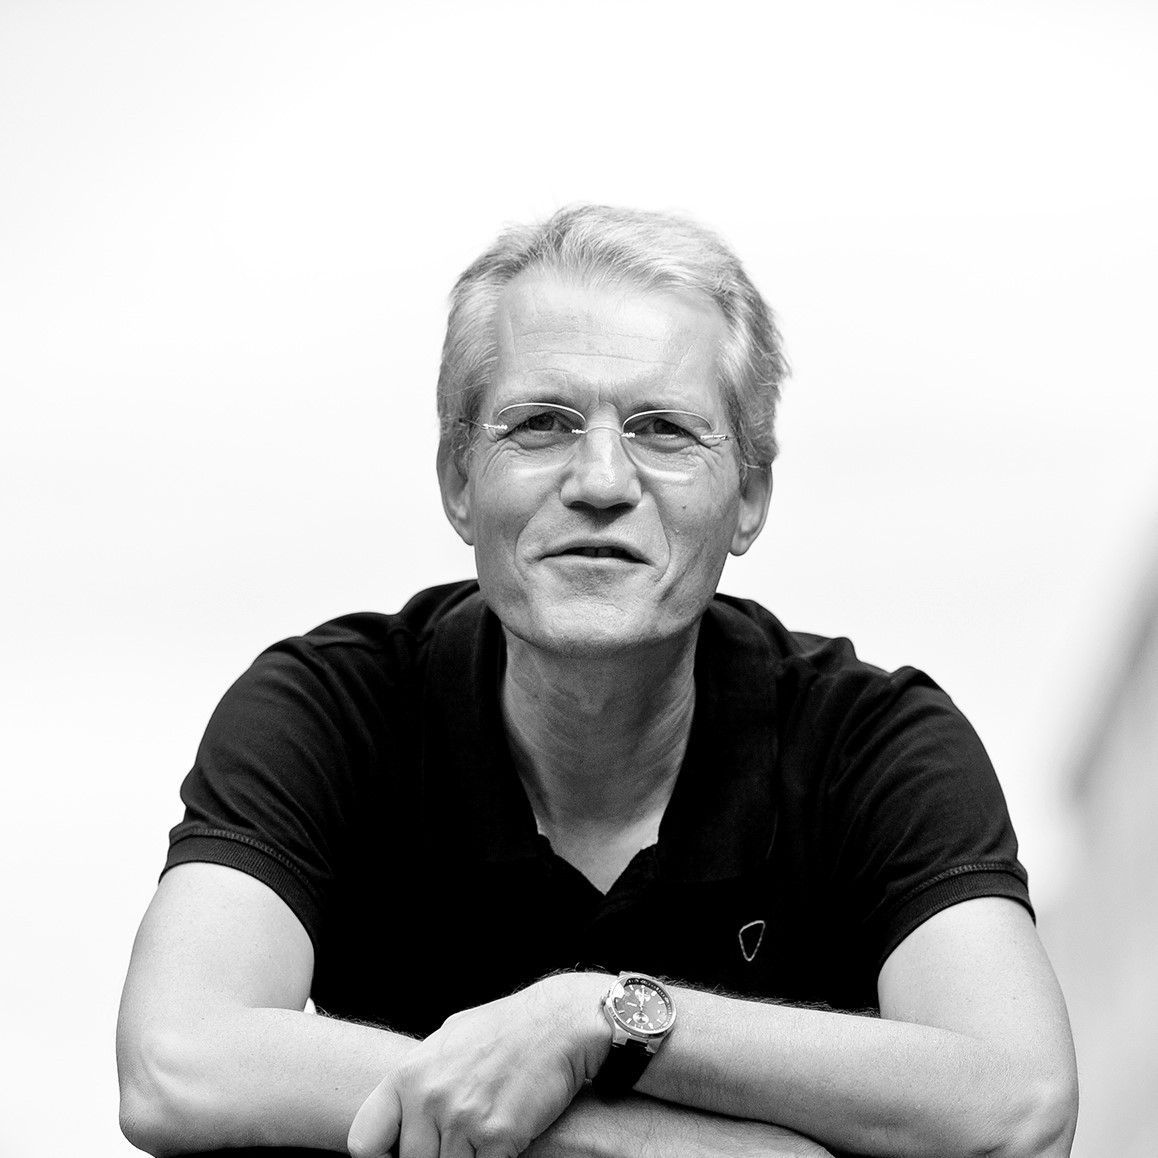 Bernd Siegler